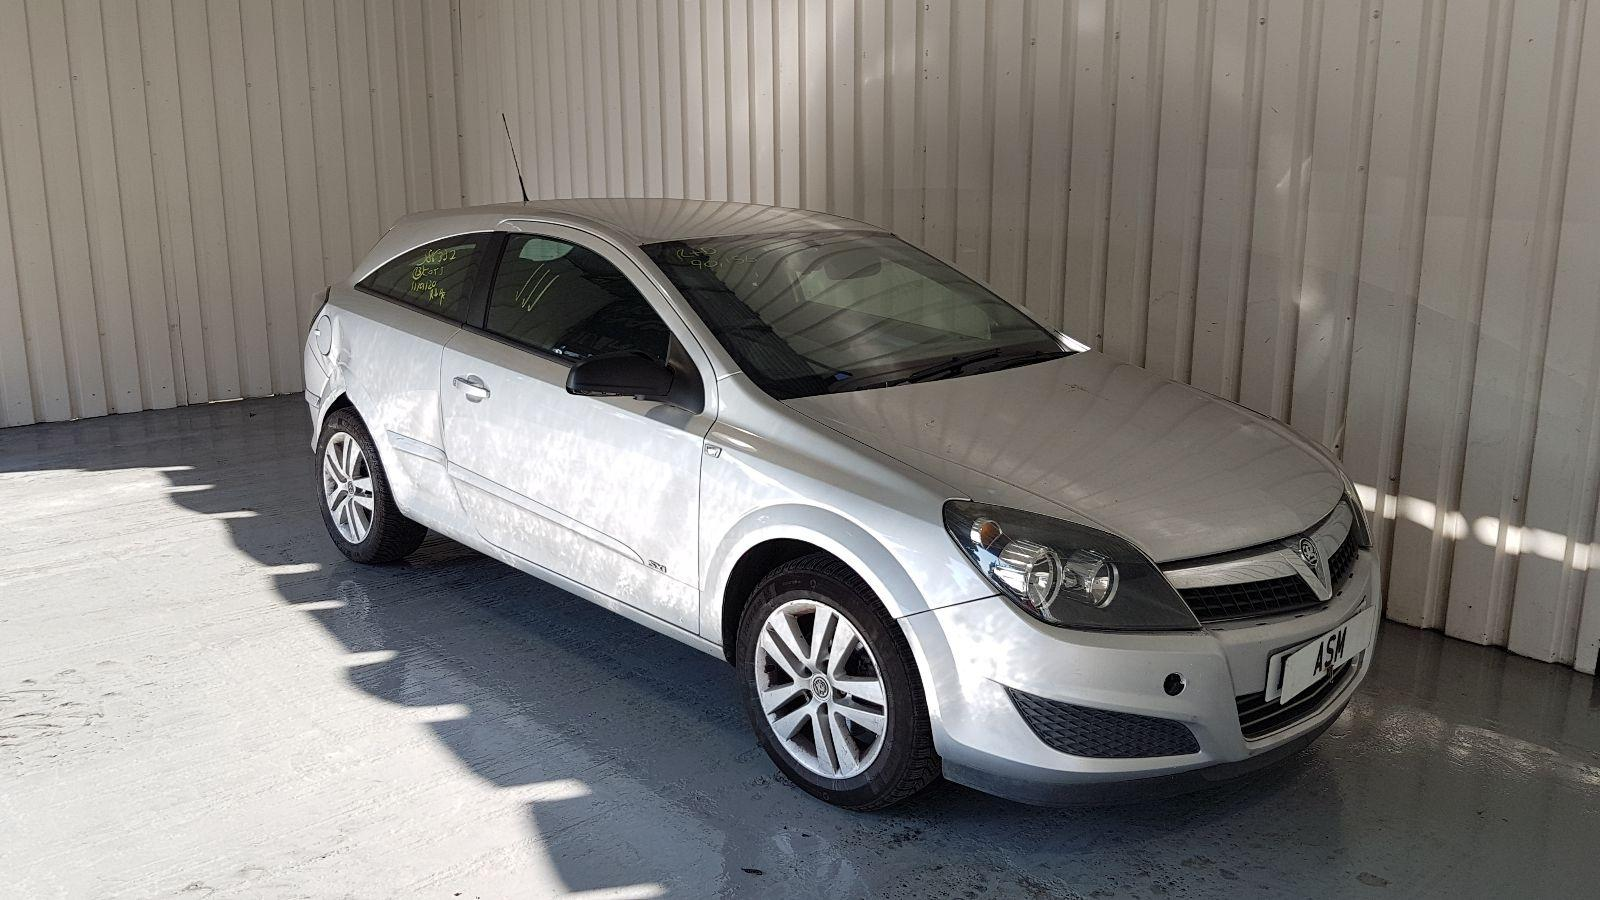 Image for a Vauxhall Astra 2008 3 Door Hatchback